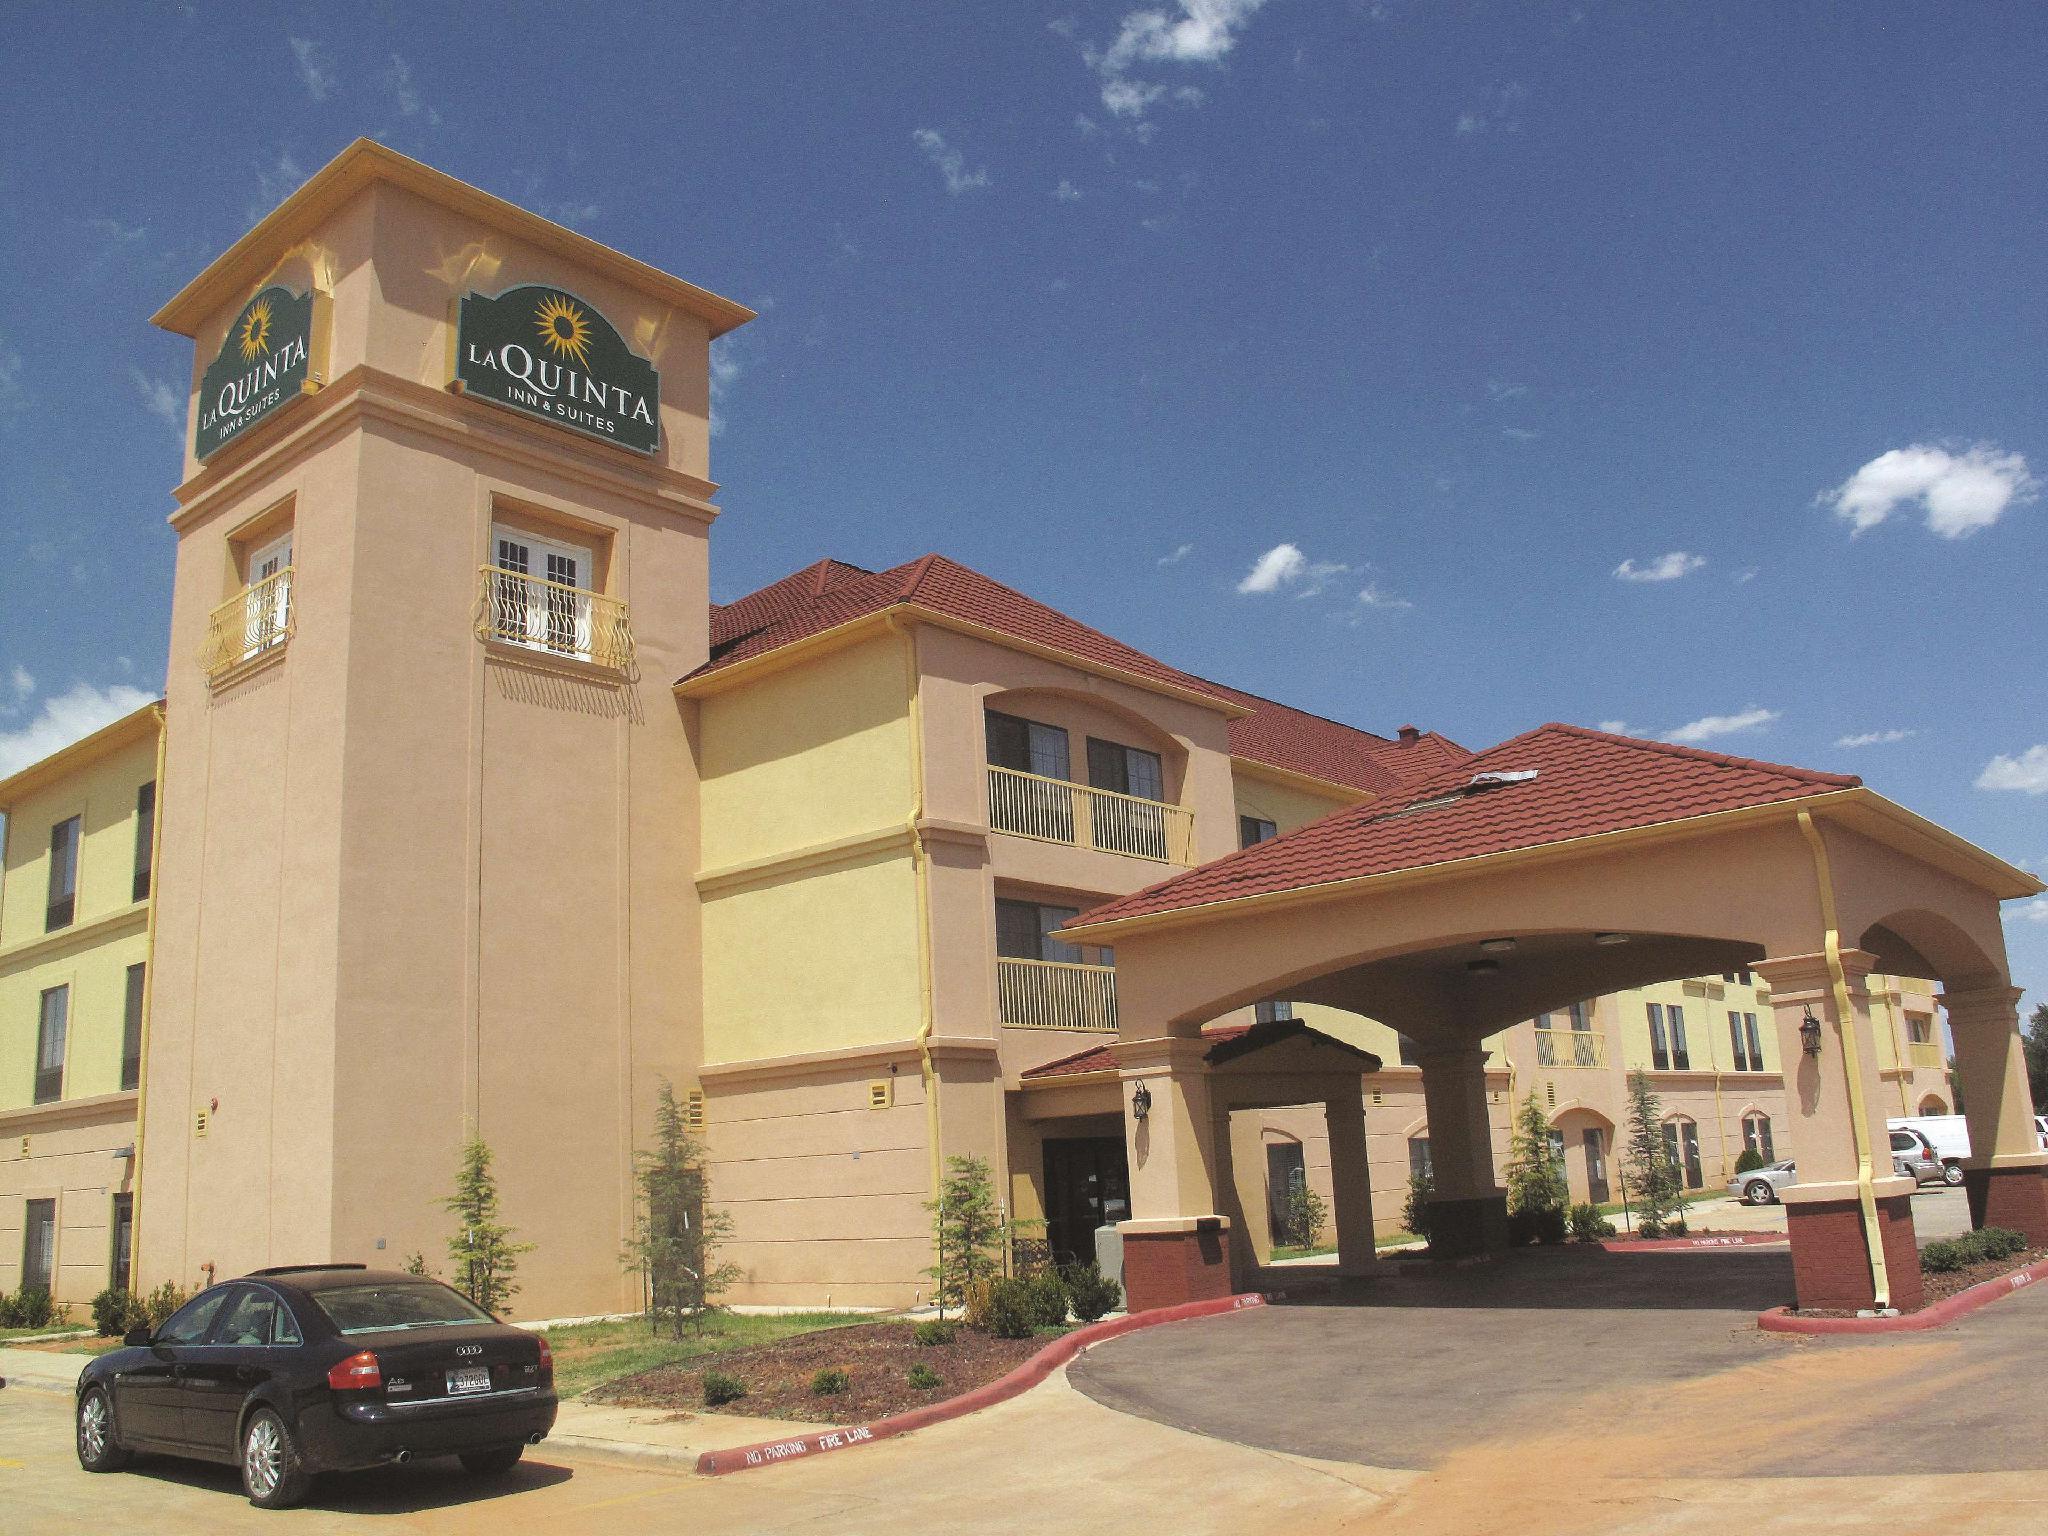 La Quinta Inn And Suites By Wyndham Woodward